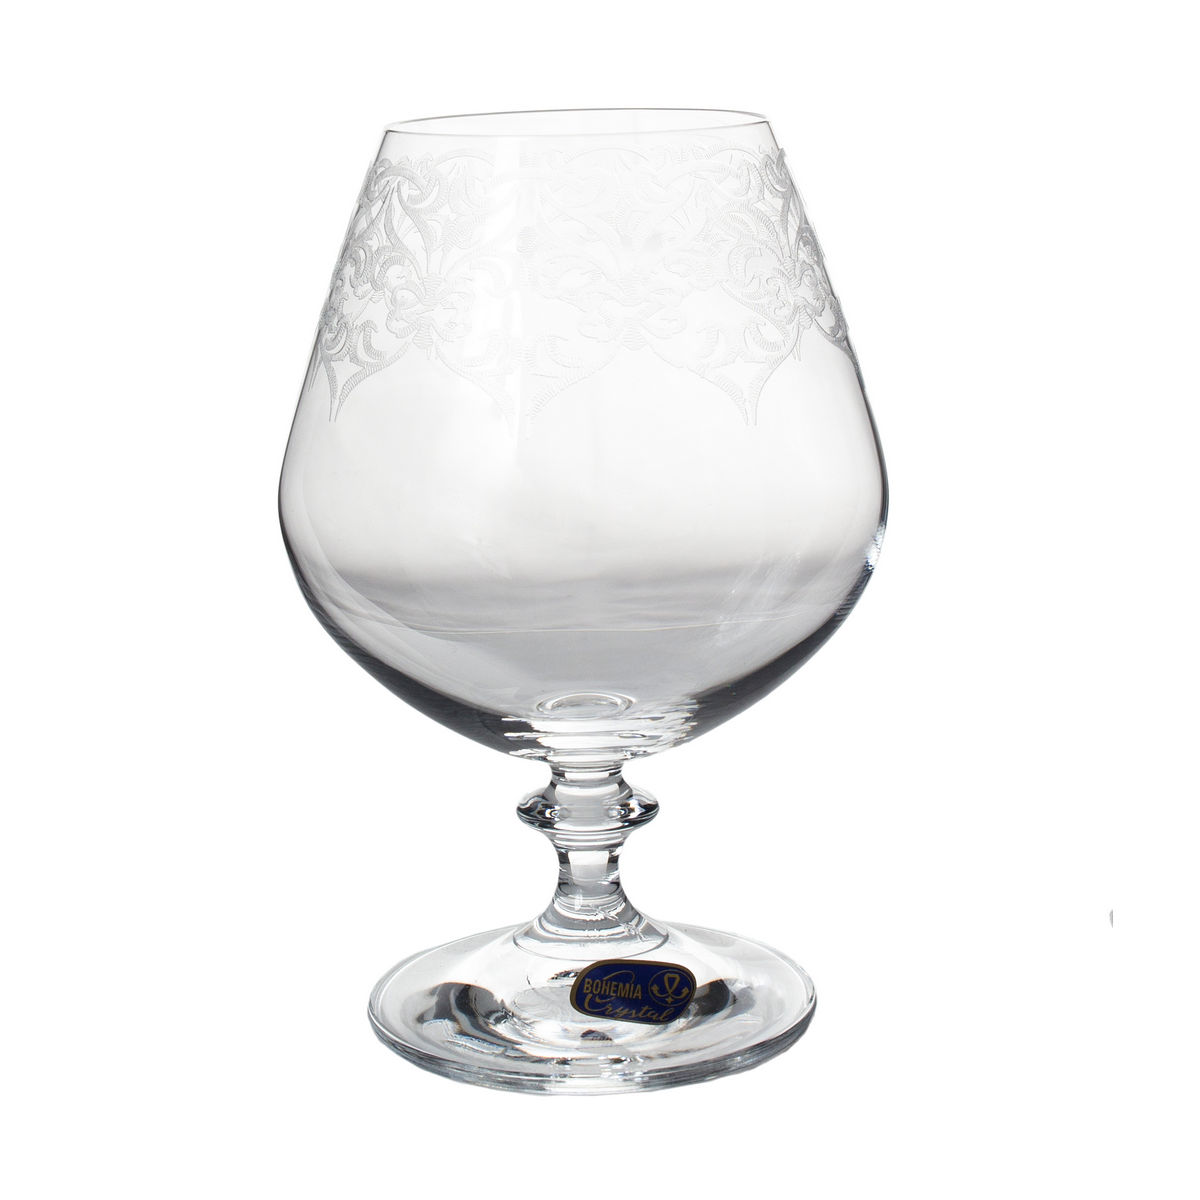 GINA Set 6 pahare cristalin brandy 400 ml